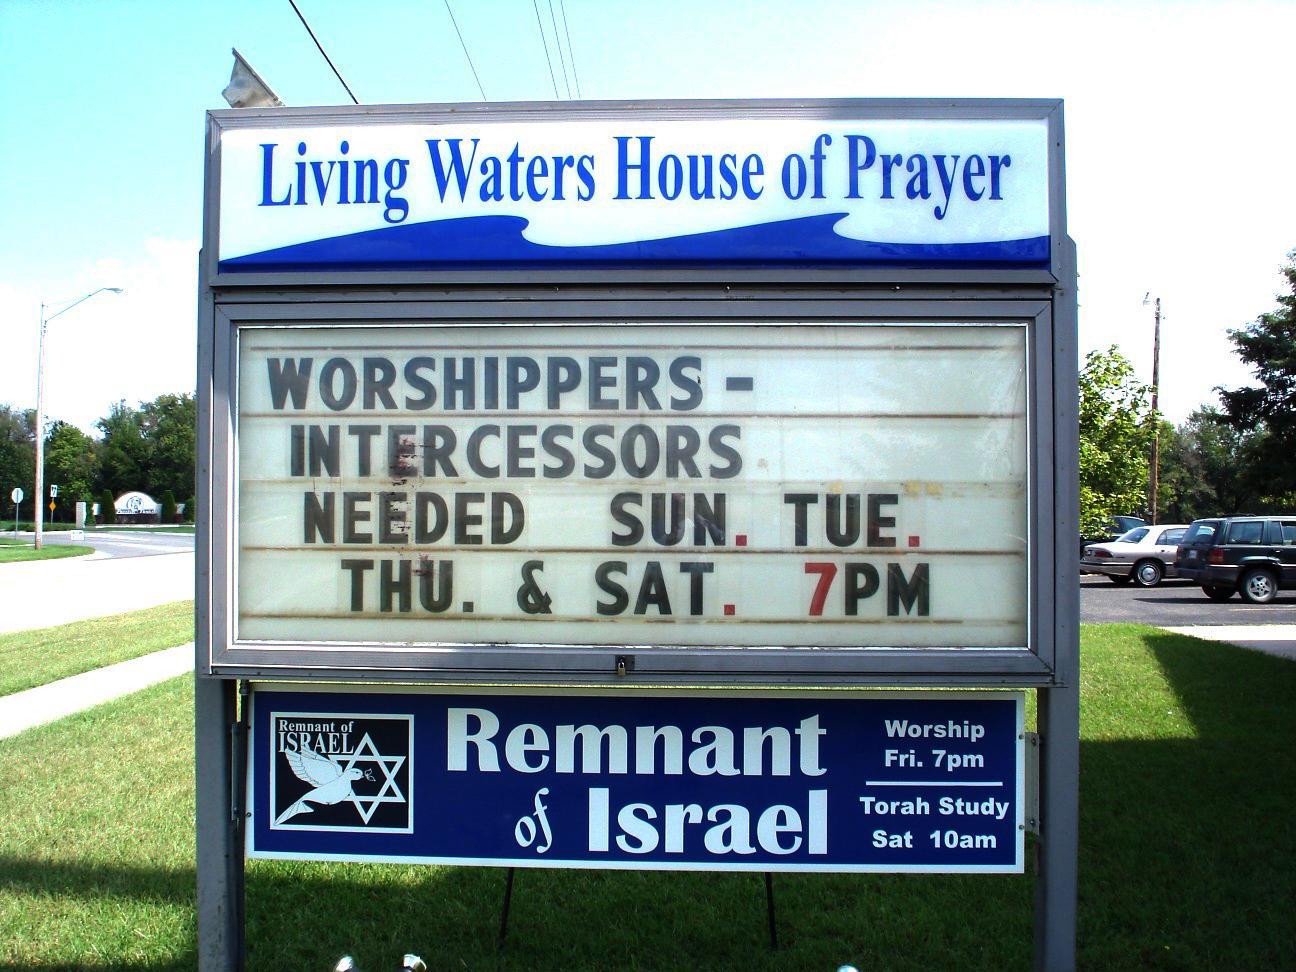 Original Owner's church sign.